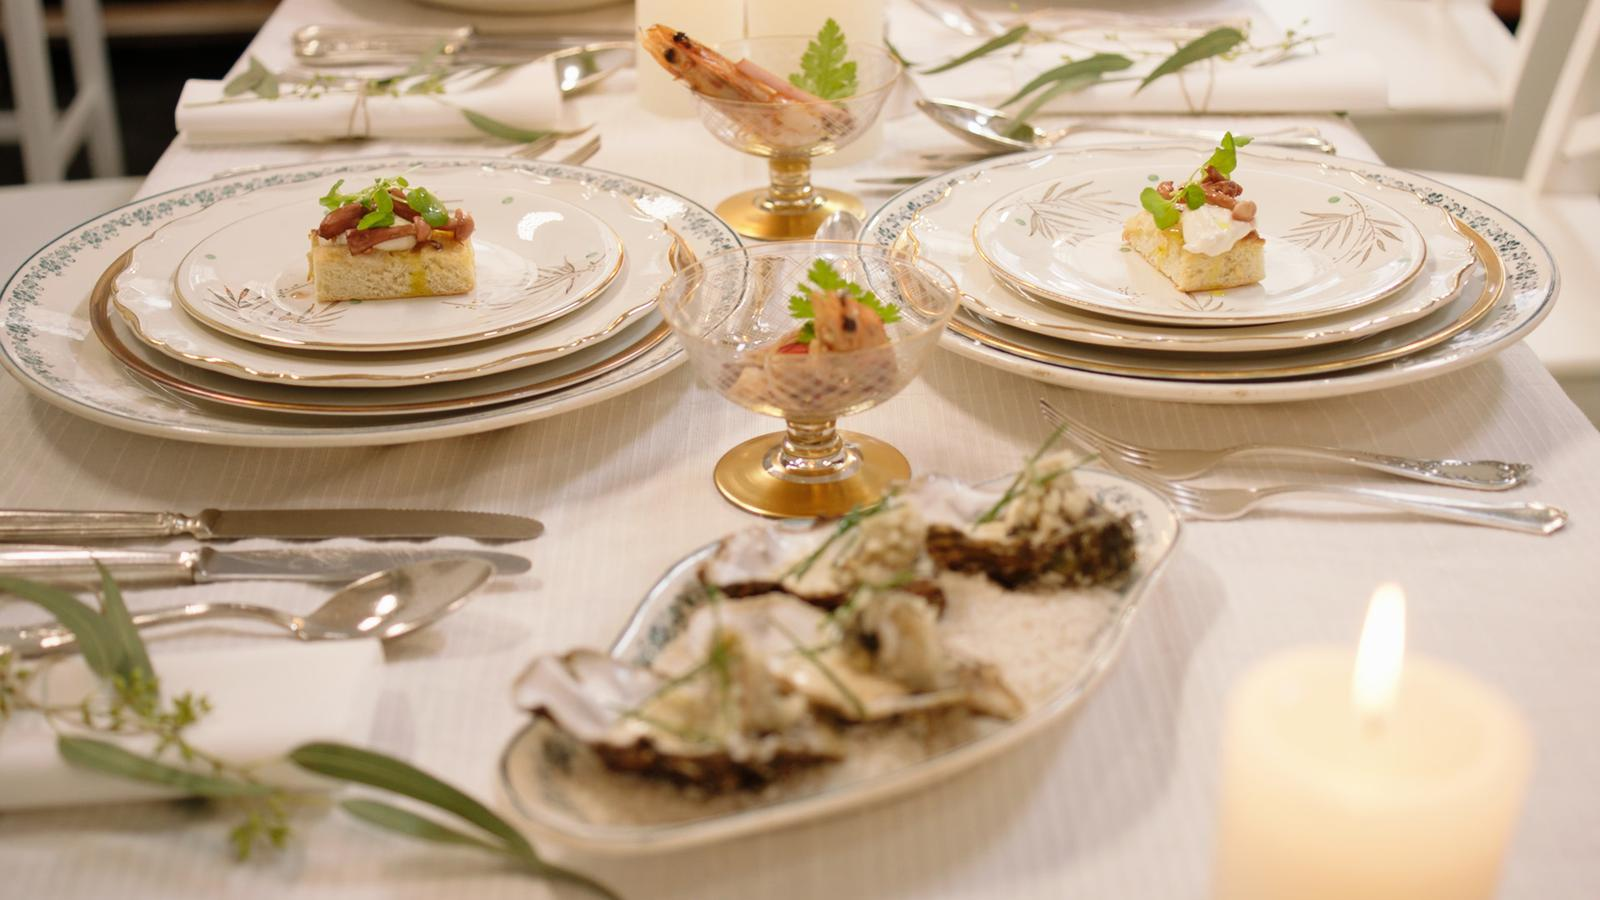 Gamba met chorizo en aïoli, oester met zwarte peper-limoenmayonaise, focaccia met burrata